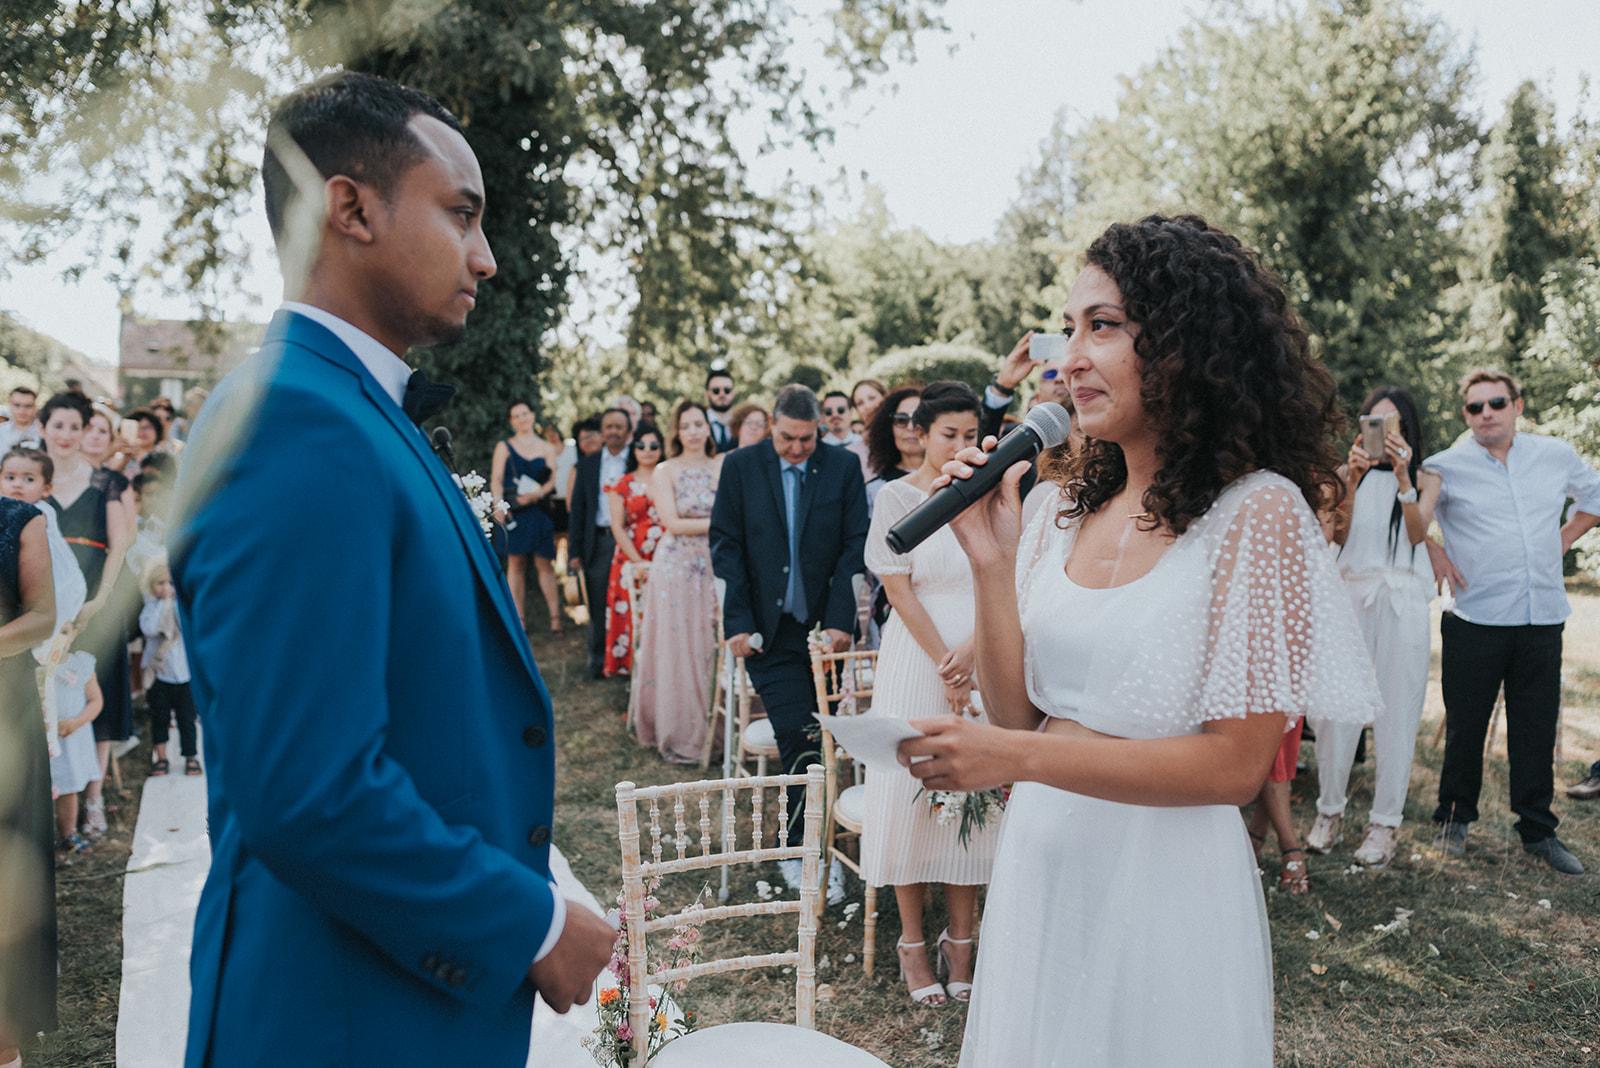 Mariage de Teddy et Arielle-286.jpg